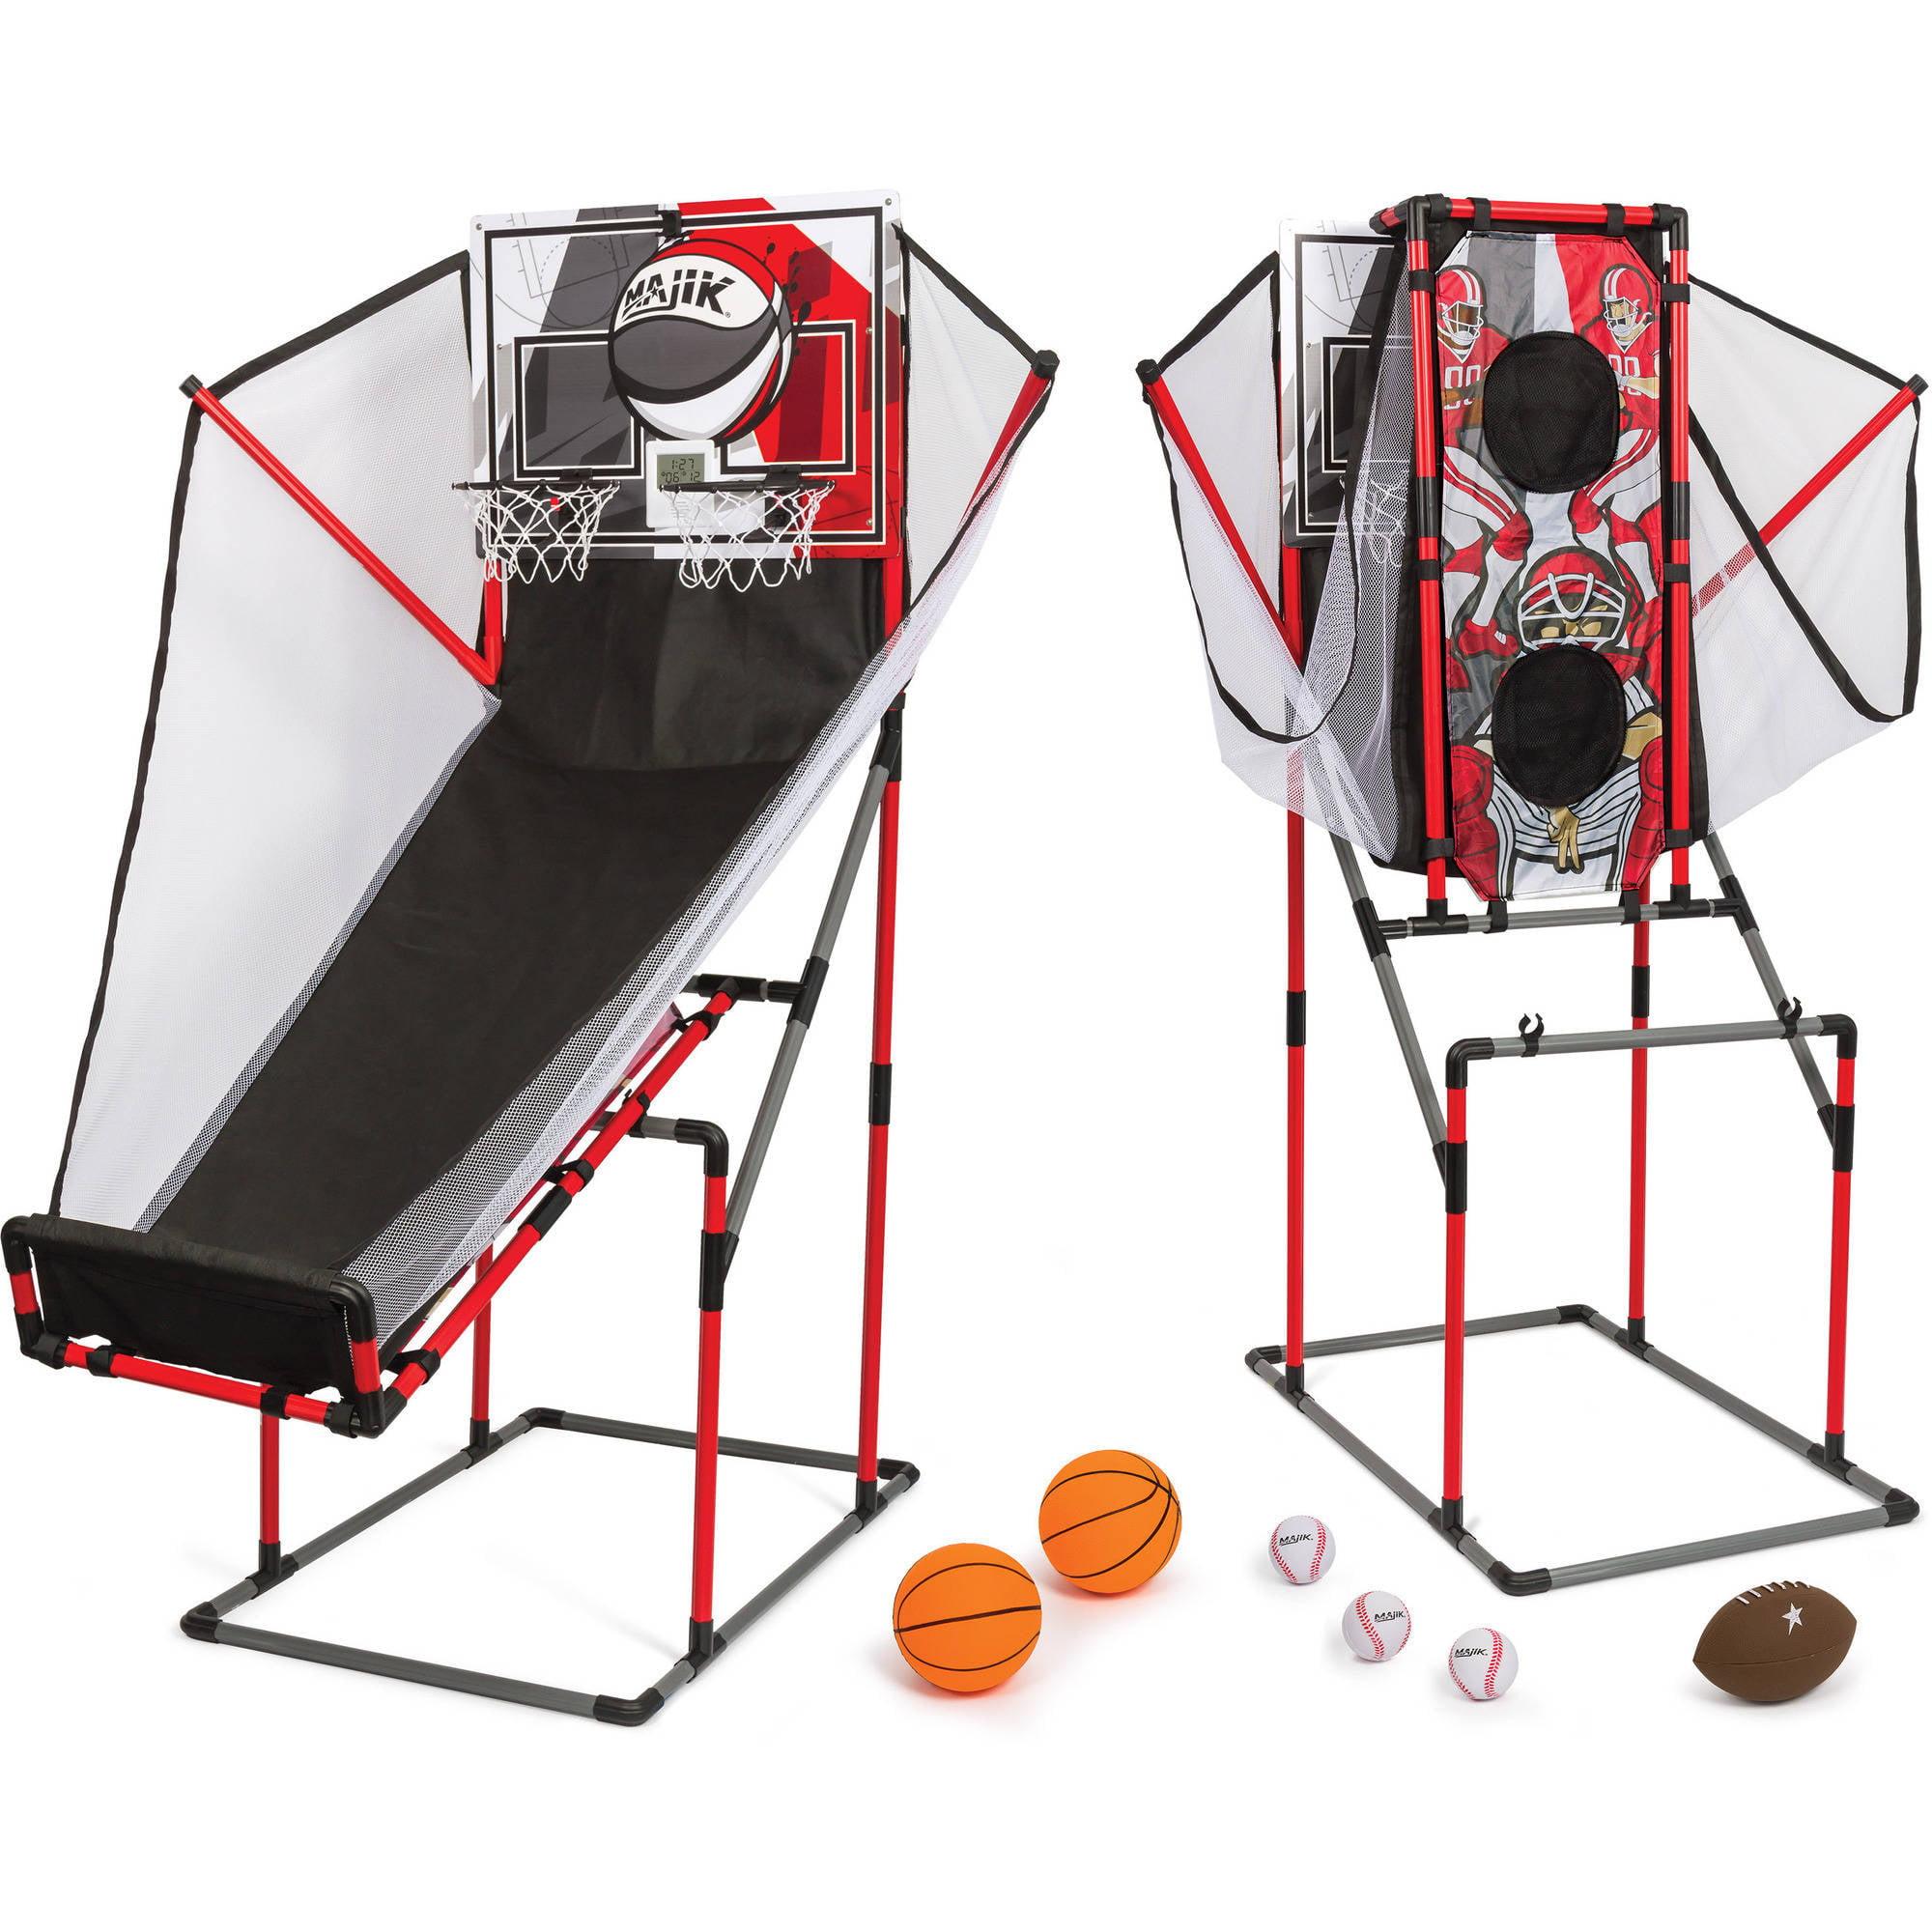 Majik 3-in-1 Arcade Sport Center, Basketball, Football, & Baseball by Eastpoint Sports